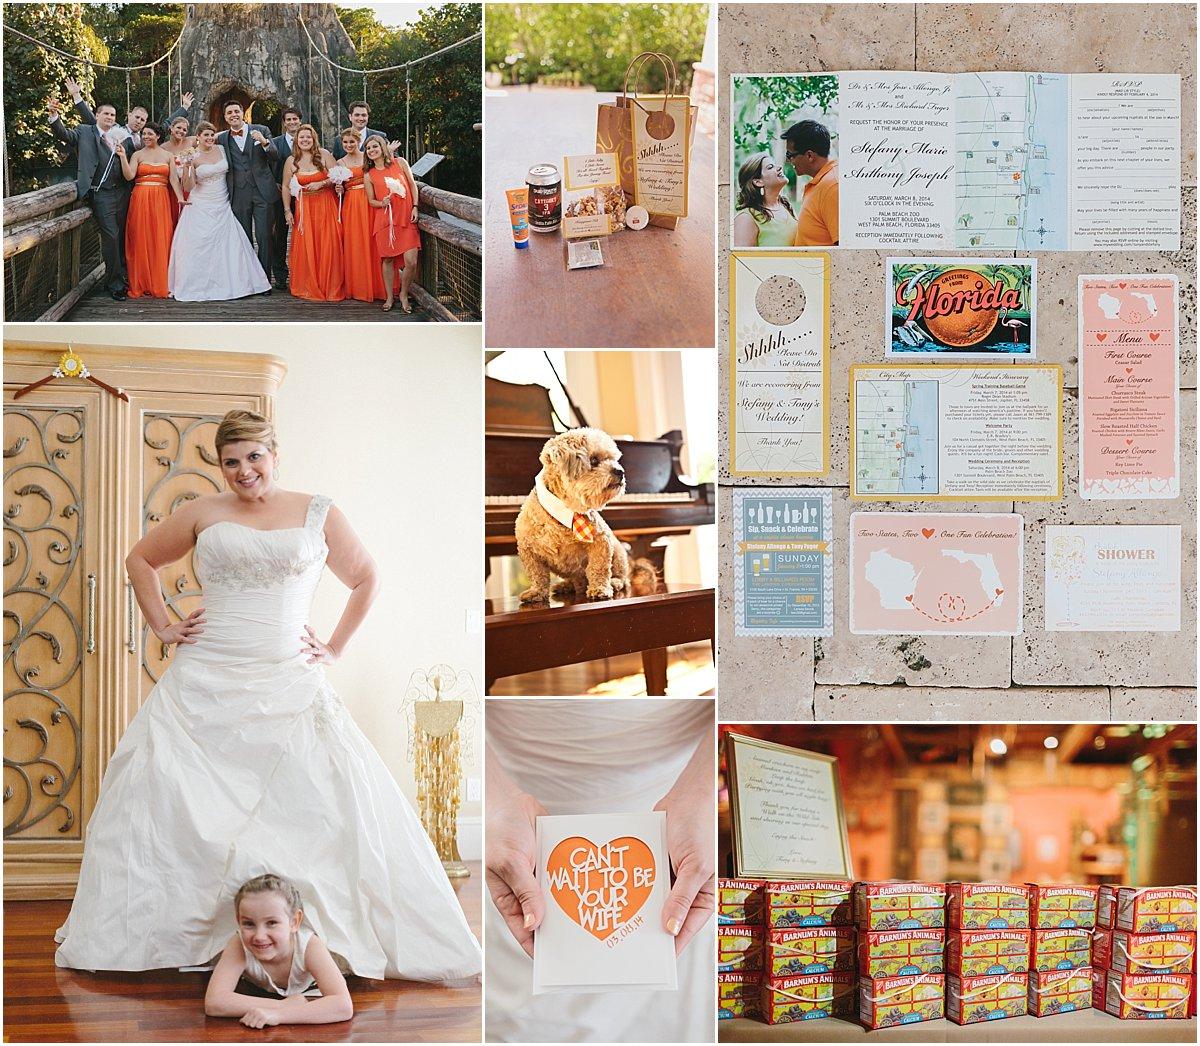 Palm Beach Zoo Wedding_Robert Madrid Photography and Krystal Zaskey Photography